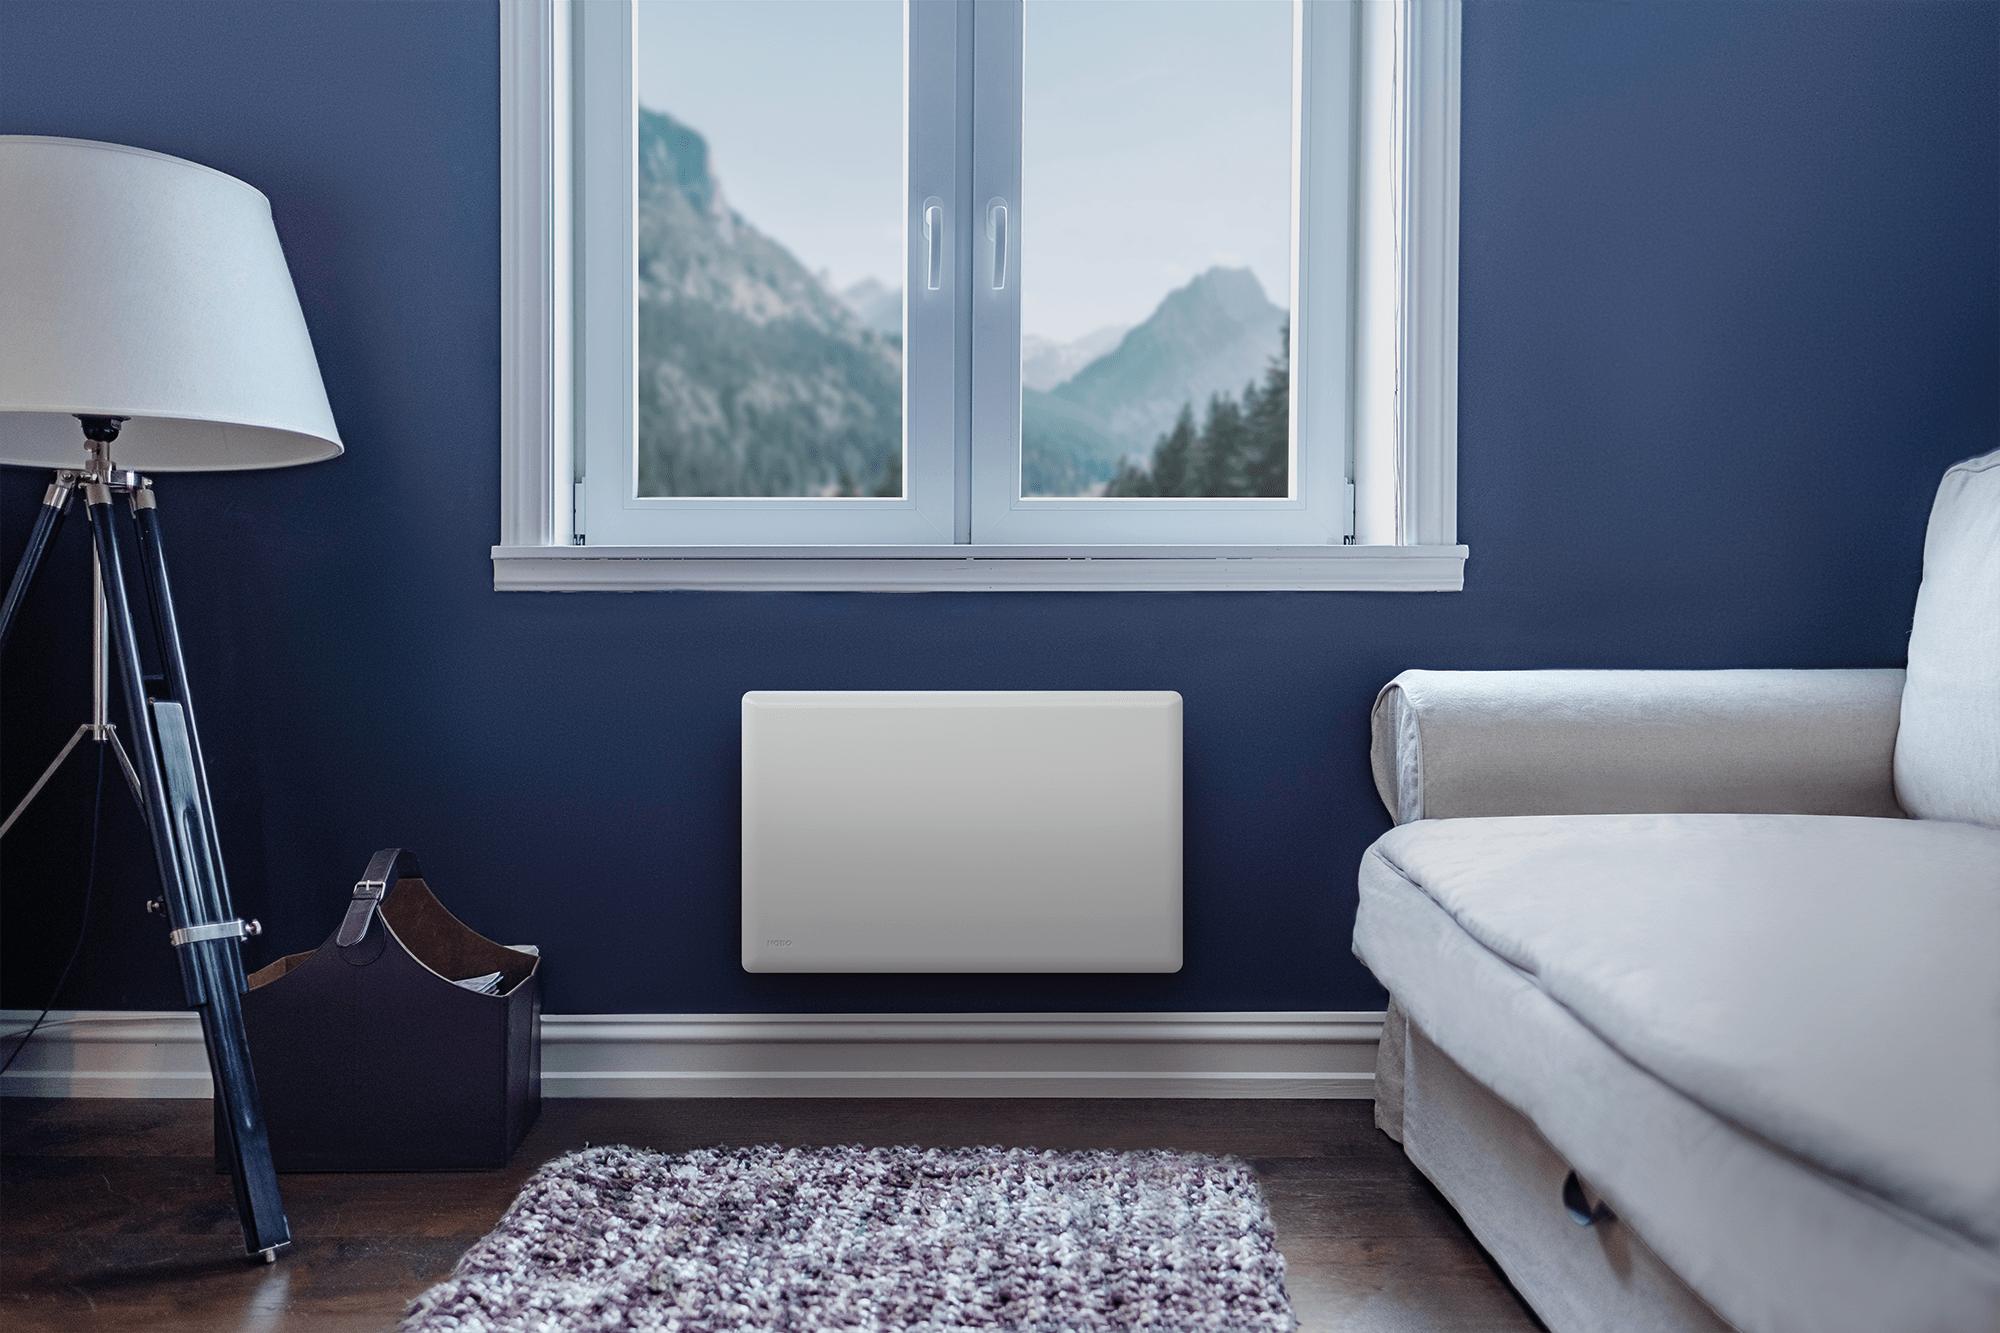 GlenDimplex_Hytte_01-top-panel-heater